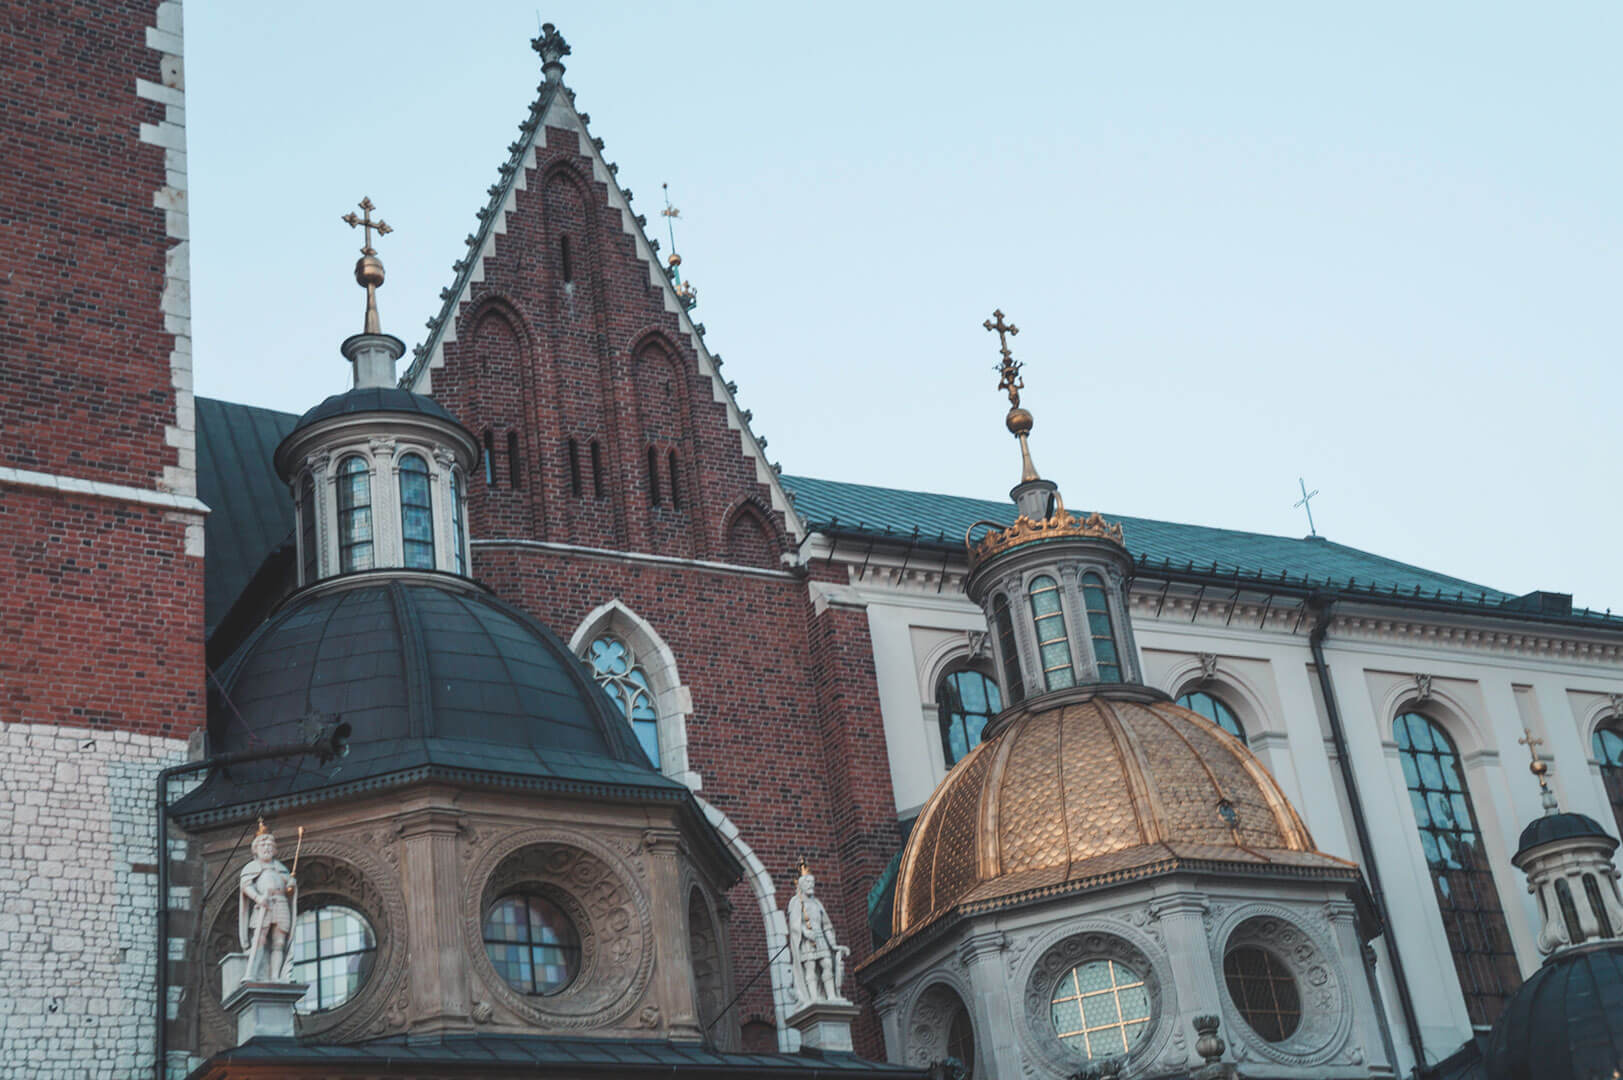 krakow-poland-la-vie-en-blog-all-rights-reserved